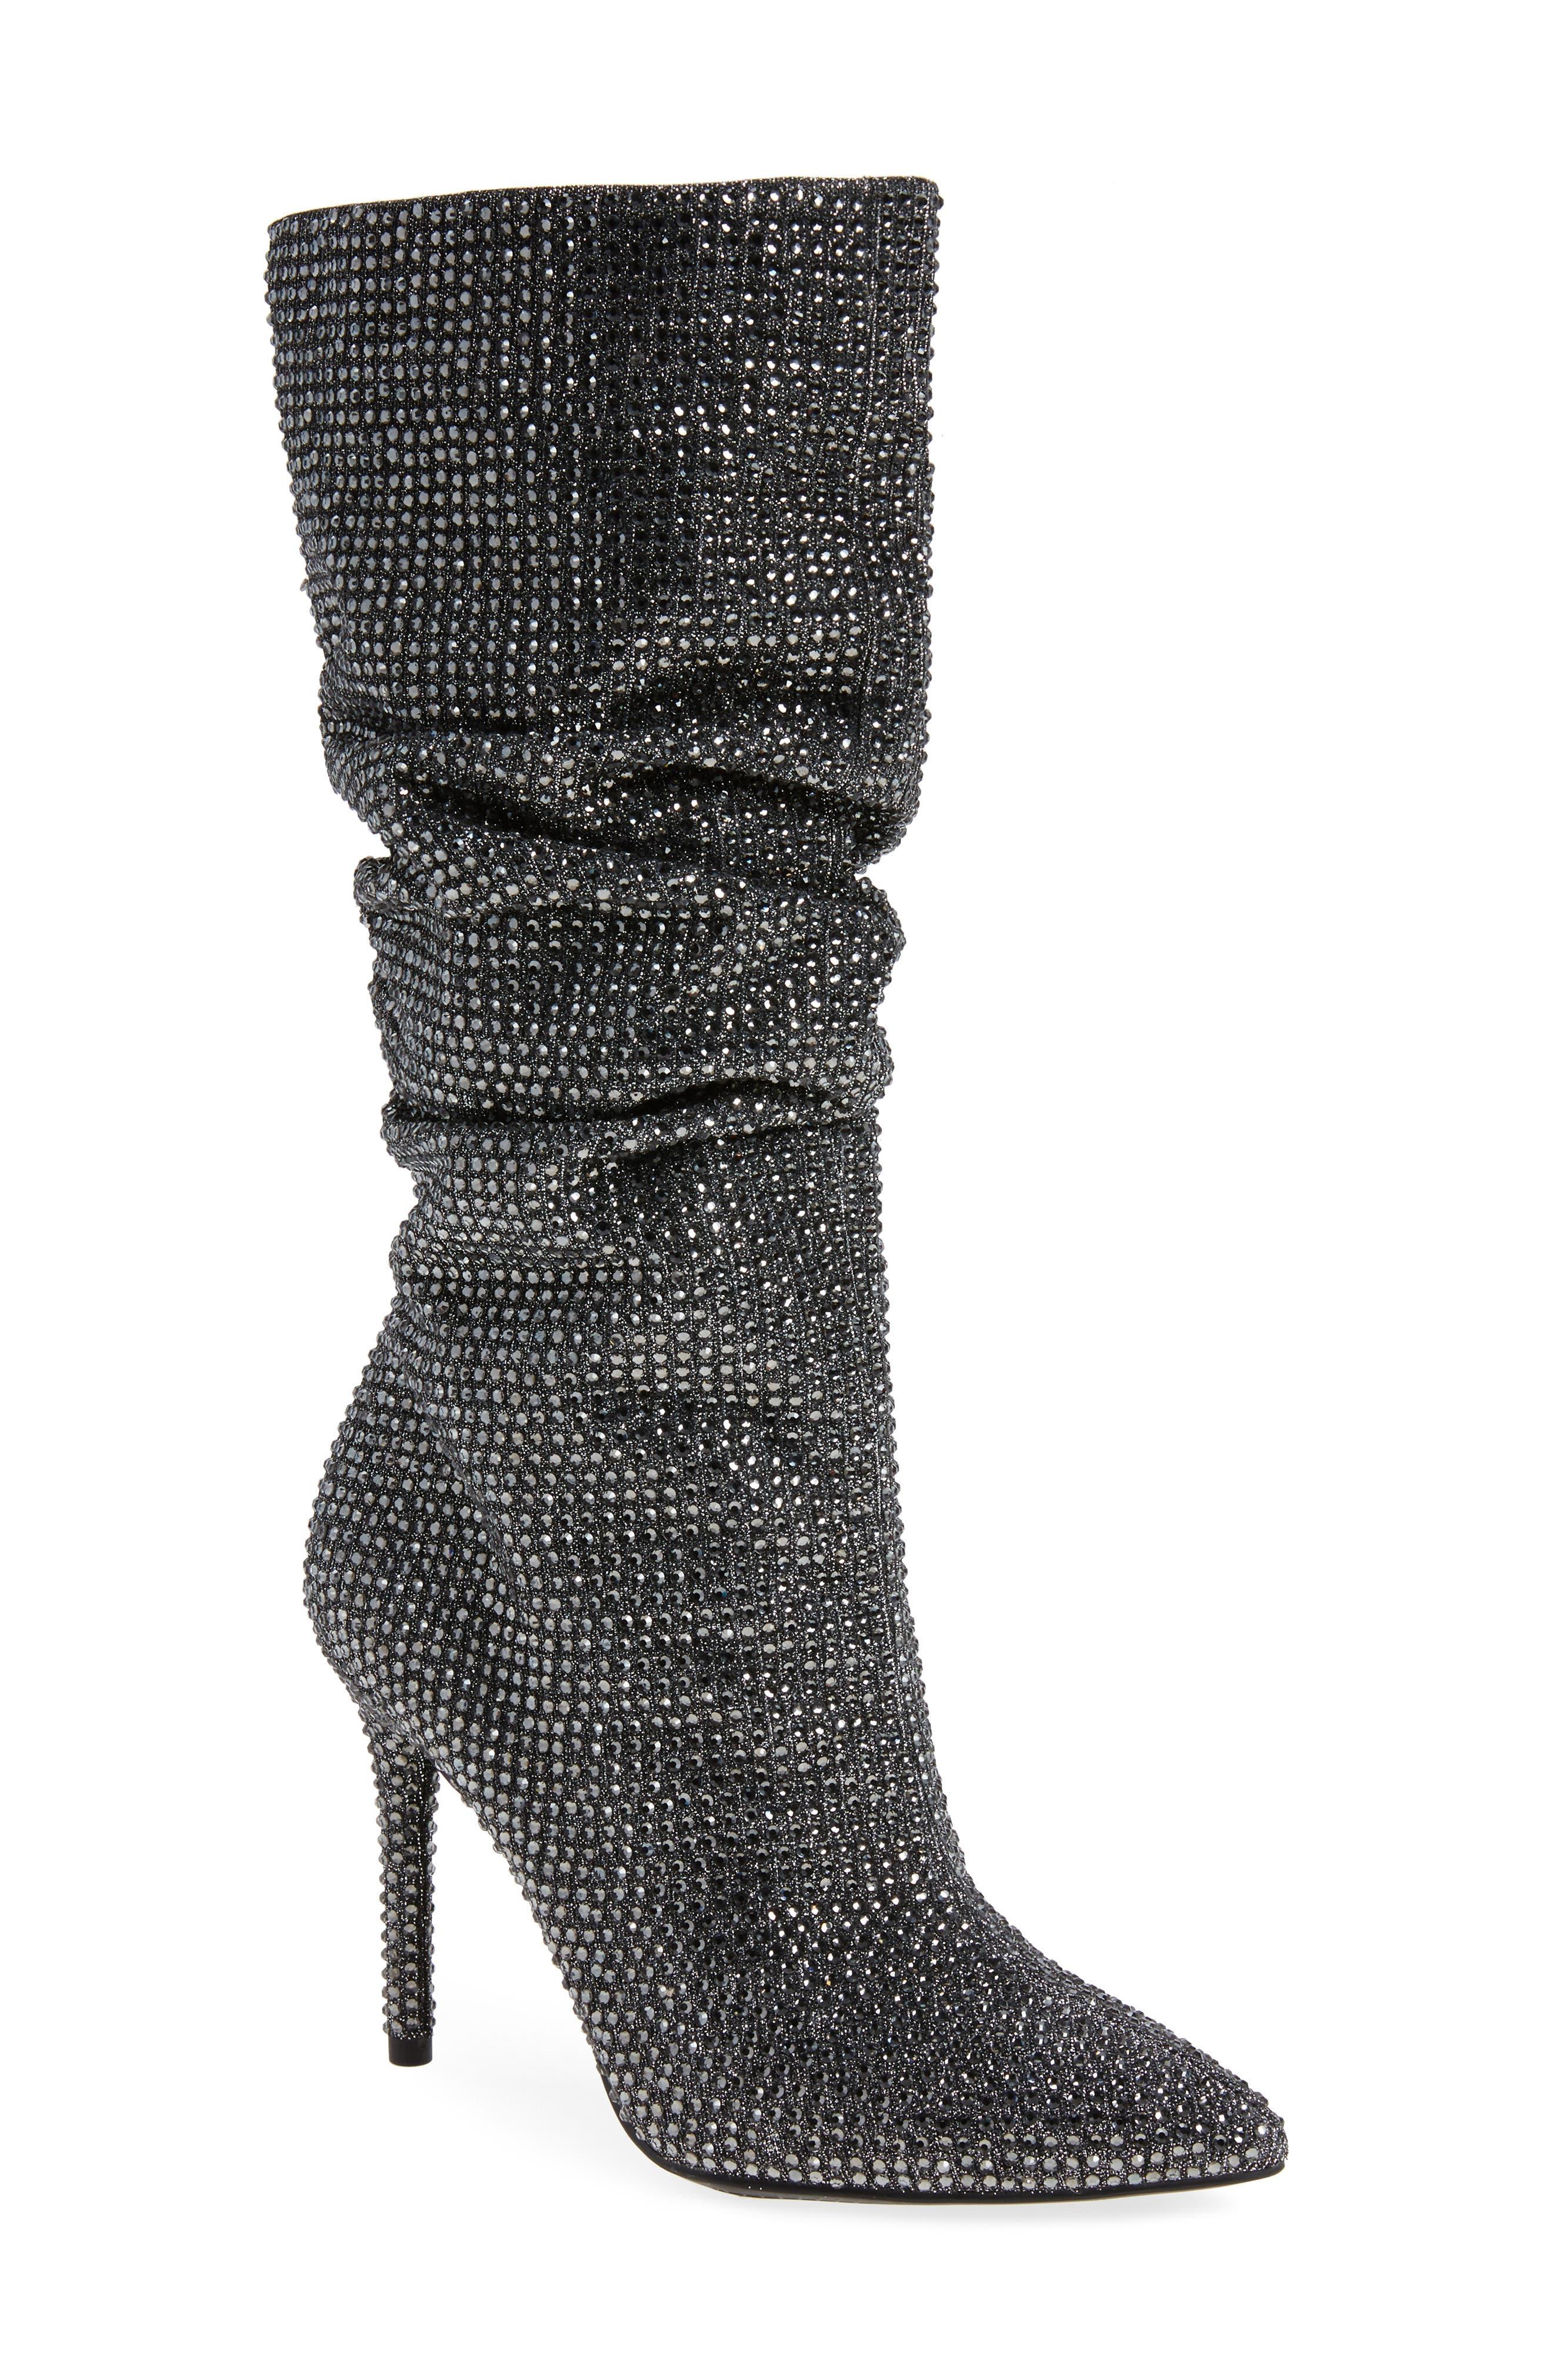 Jessica Simpson Layzer Embellished Slouch Boot- Metallic